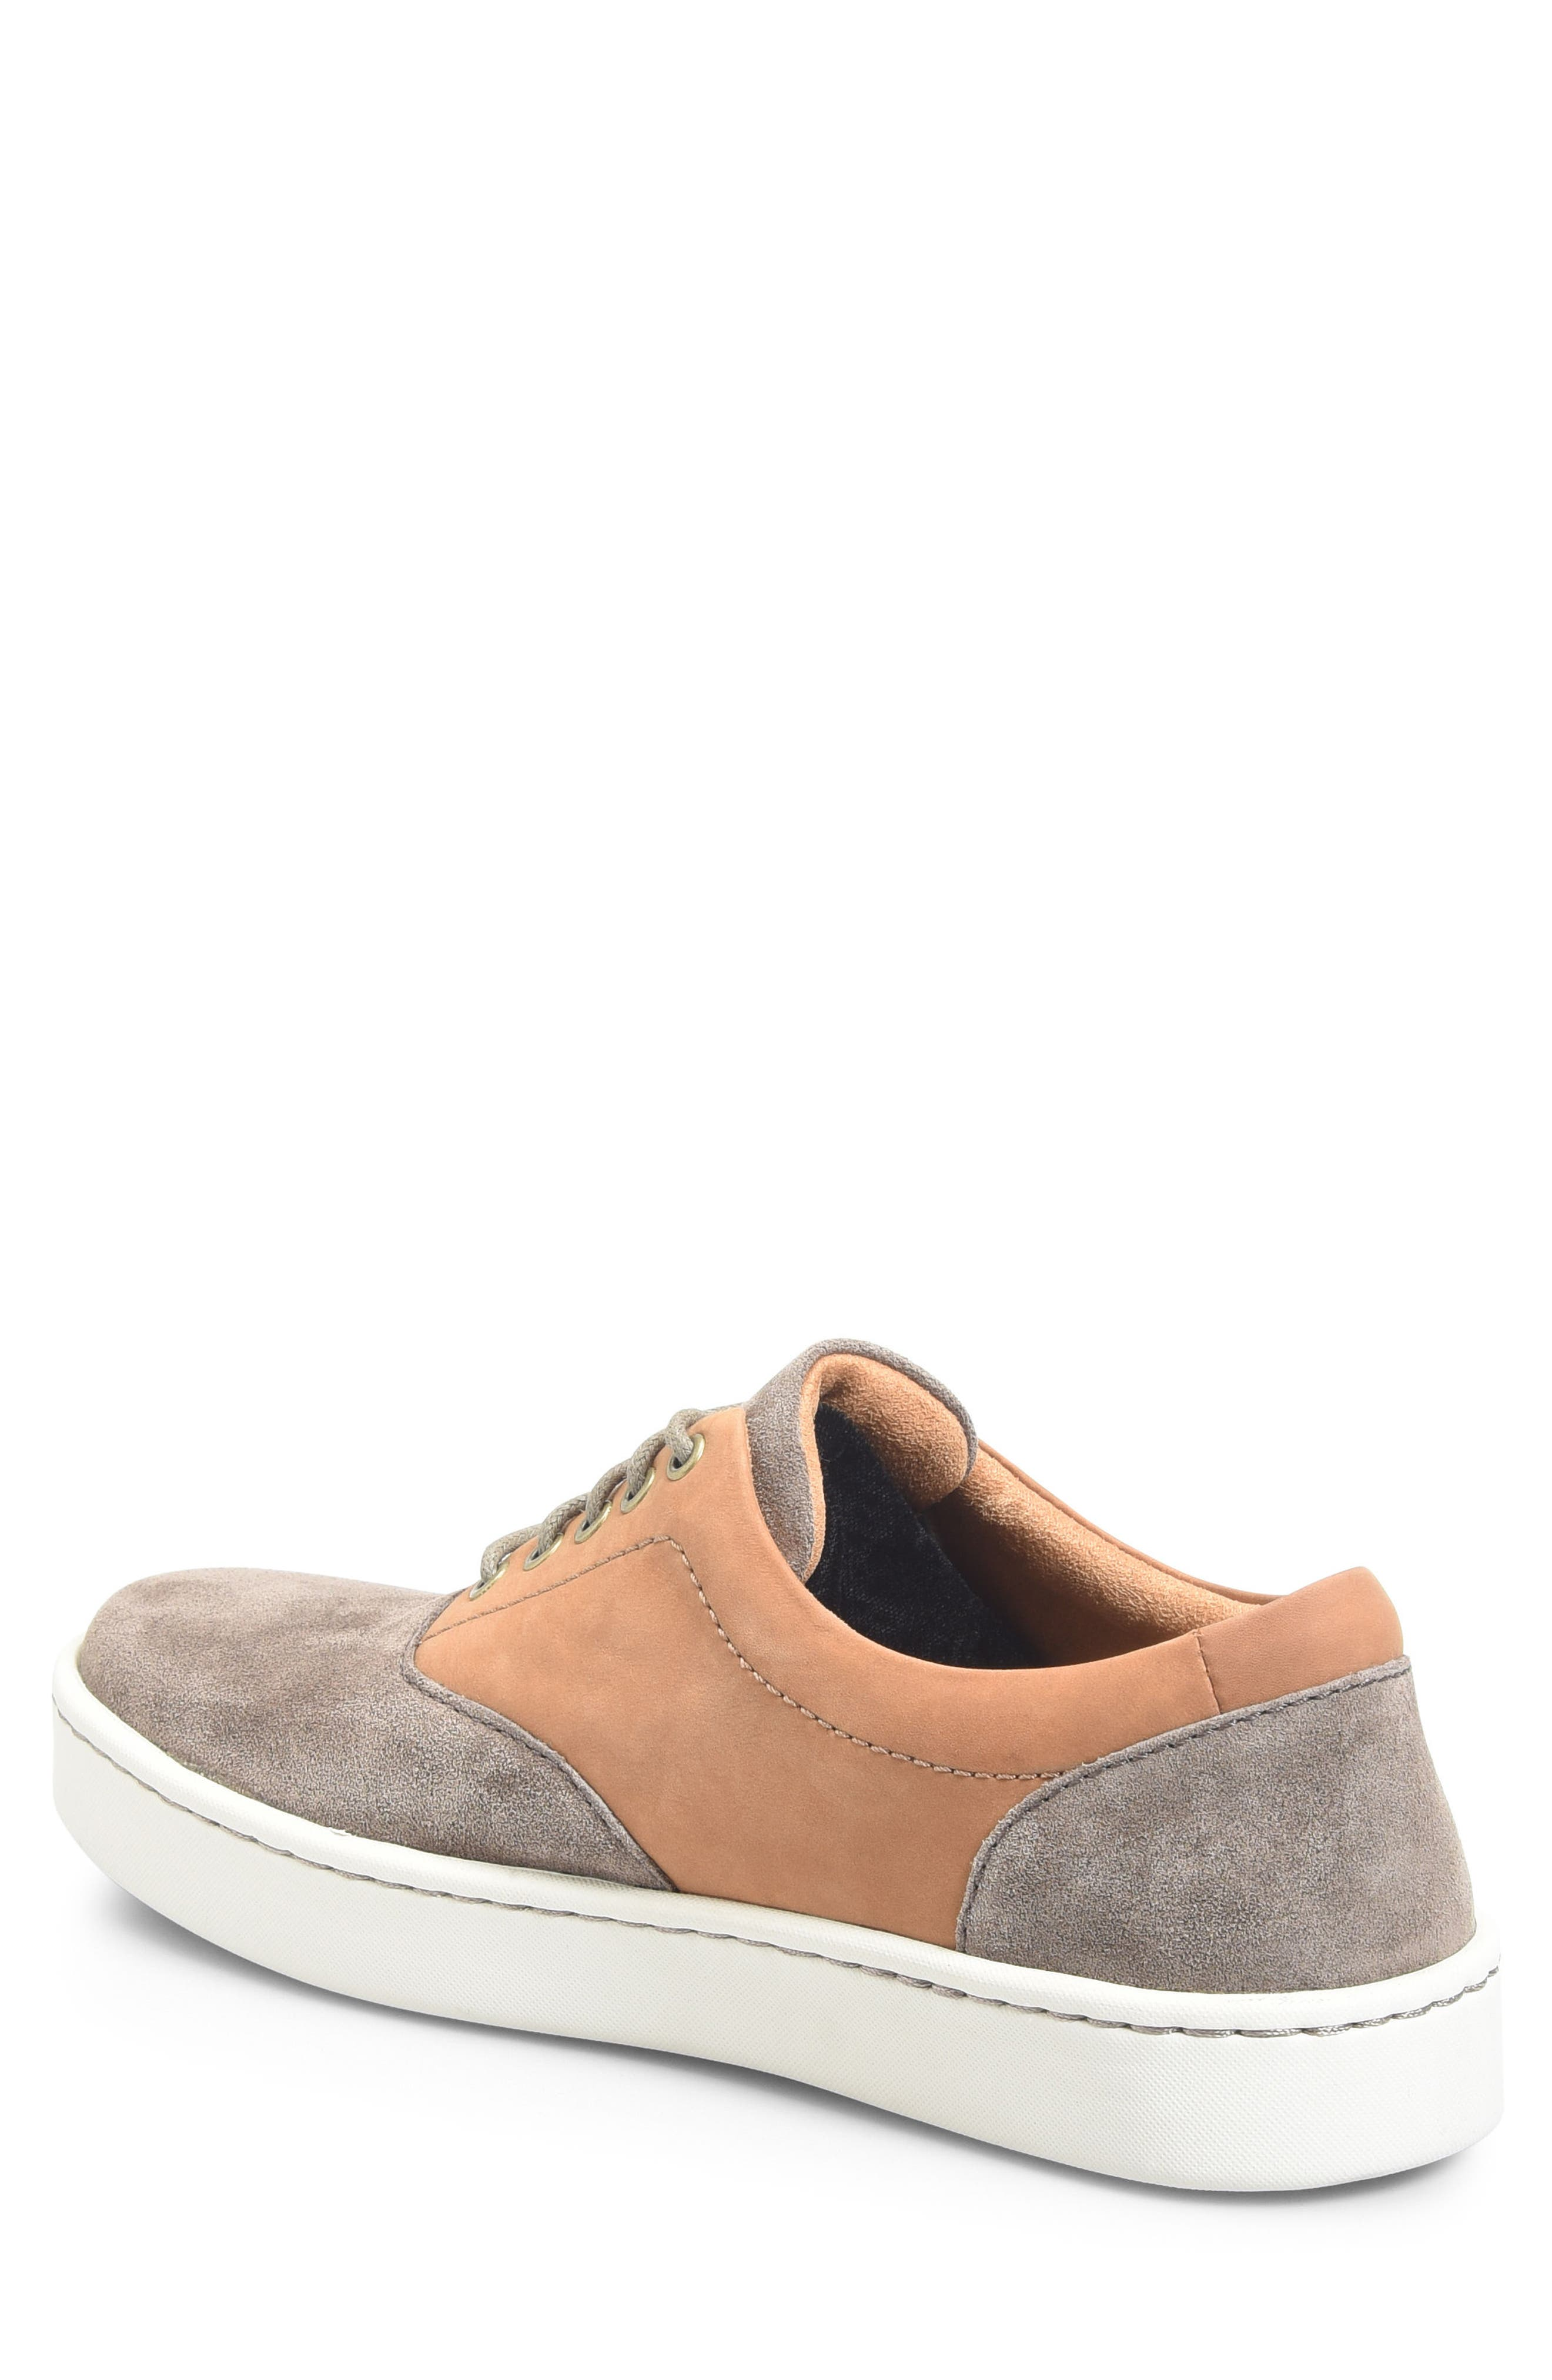 Keystone Low Top Sneaker,                             Alternate thumbnail 5, color,